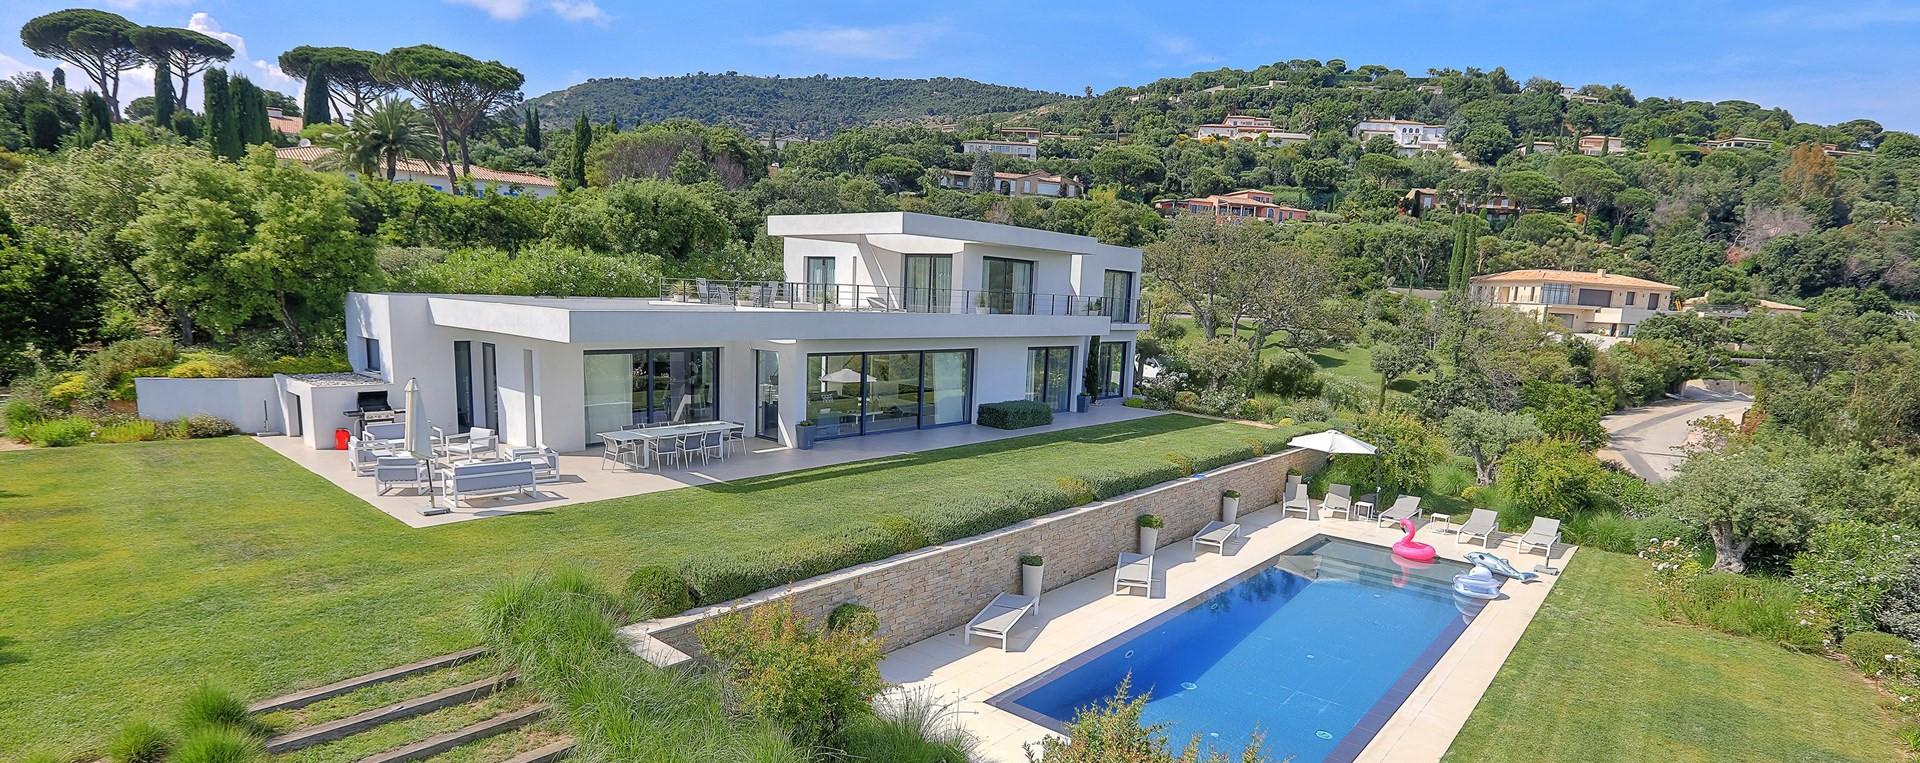 luxury-5-bedroom-villa-cote-d-azur